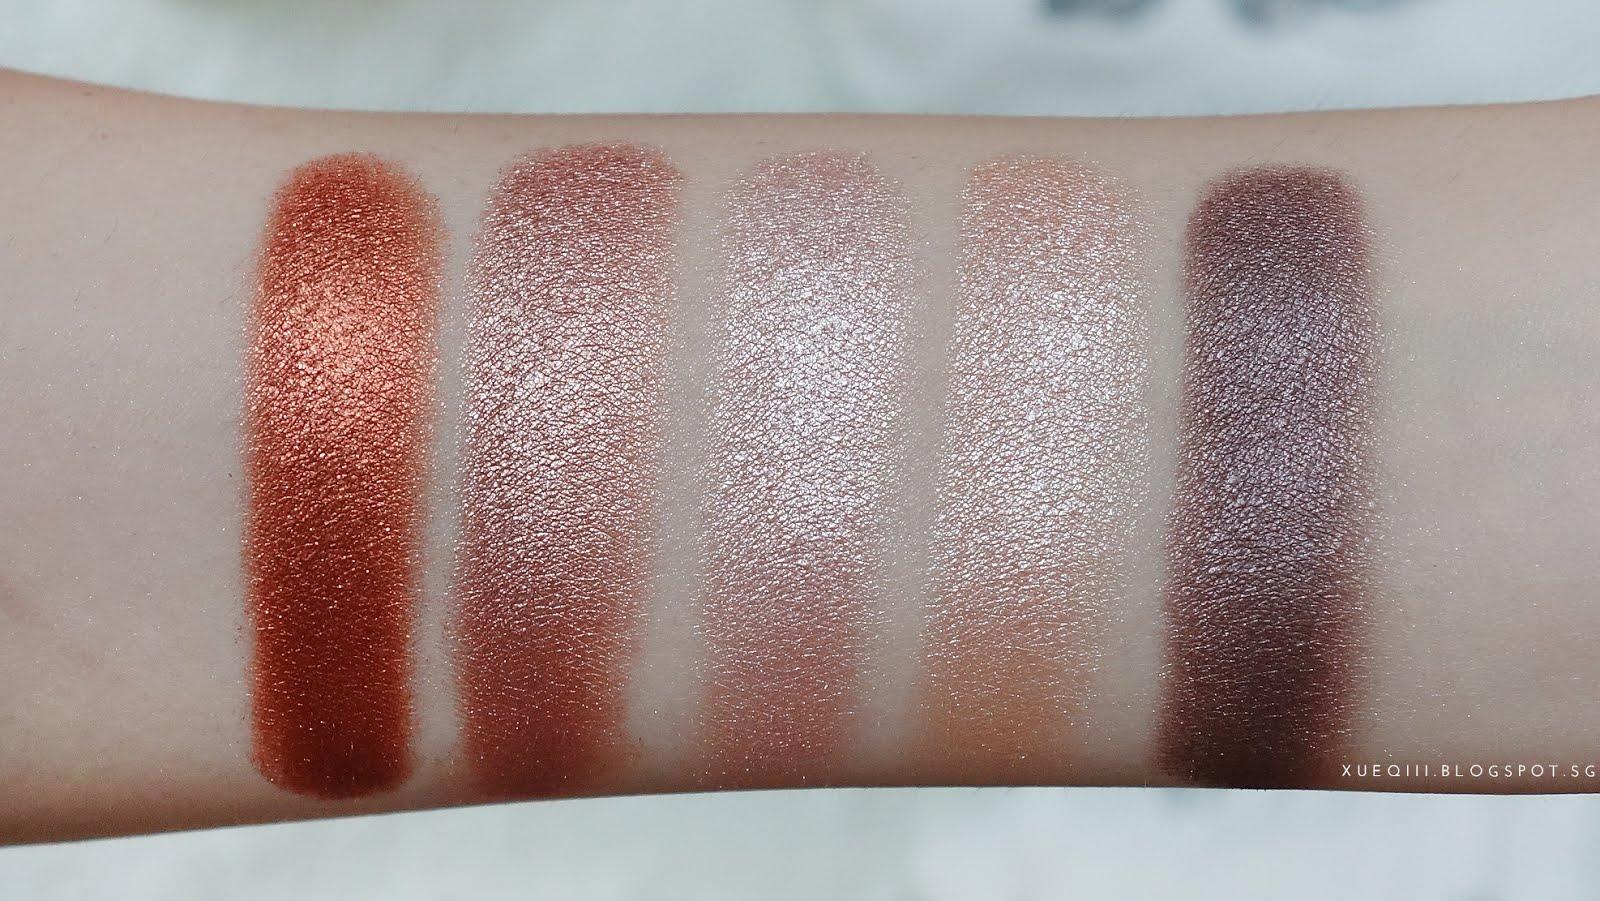 f143a0379ad Makeup Geek | Eye Shadows, Foiled Shadows, Pigments, Blush and ...